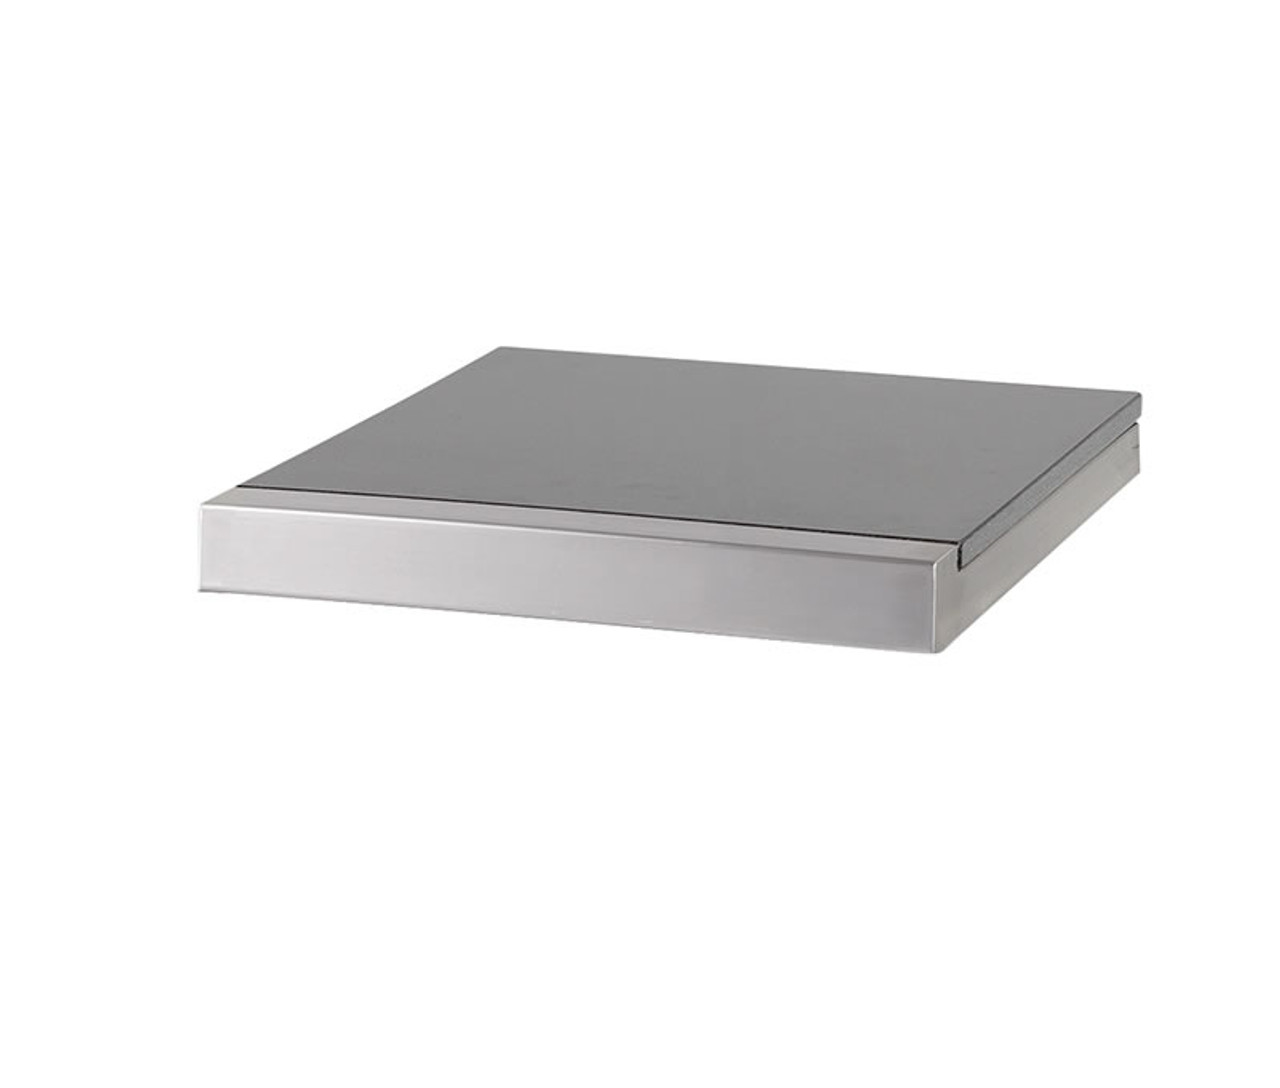 Gasmate Granite Top for 1 Door 118L Beverage Cabinet